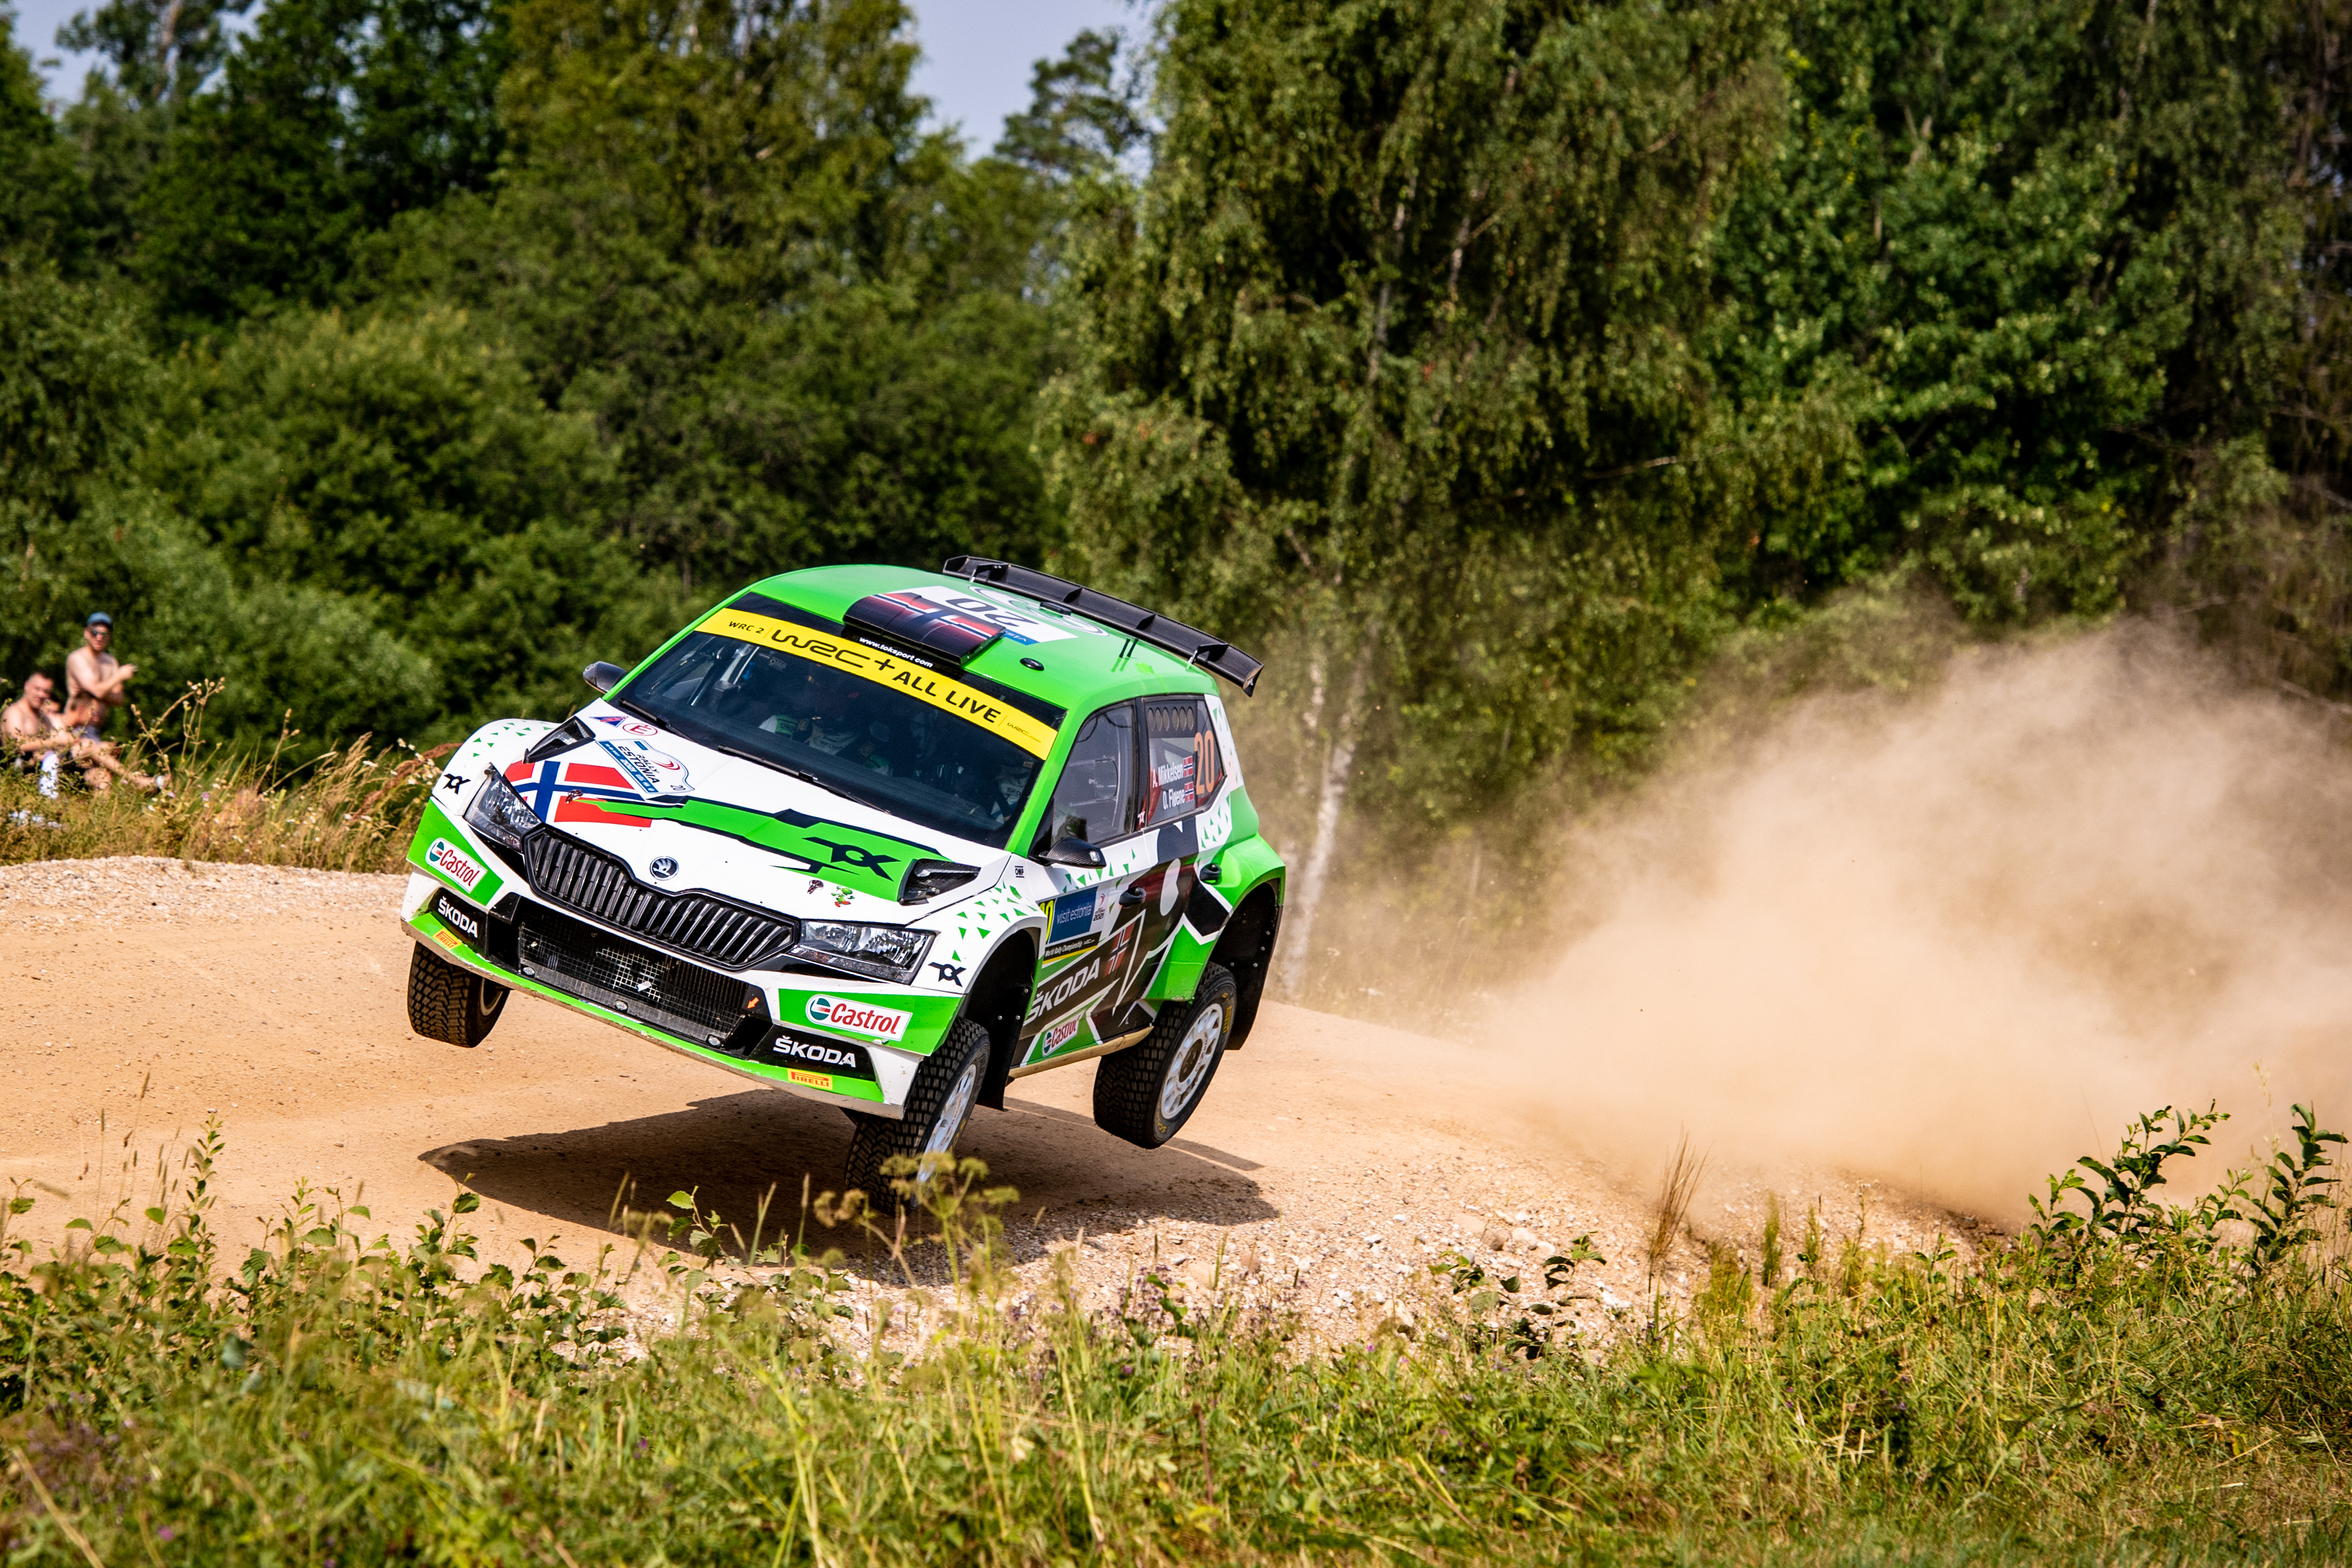 SKODA crews win WRC2 and WRC3 at Rally Estonia - Image 7